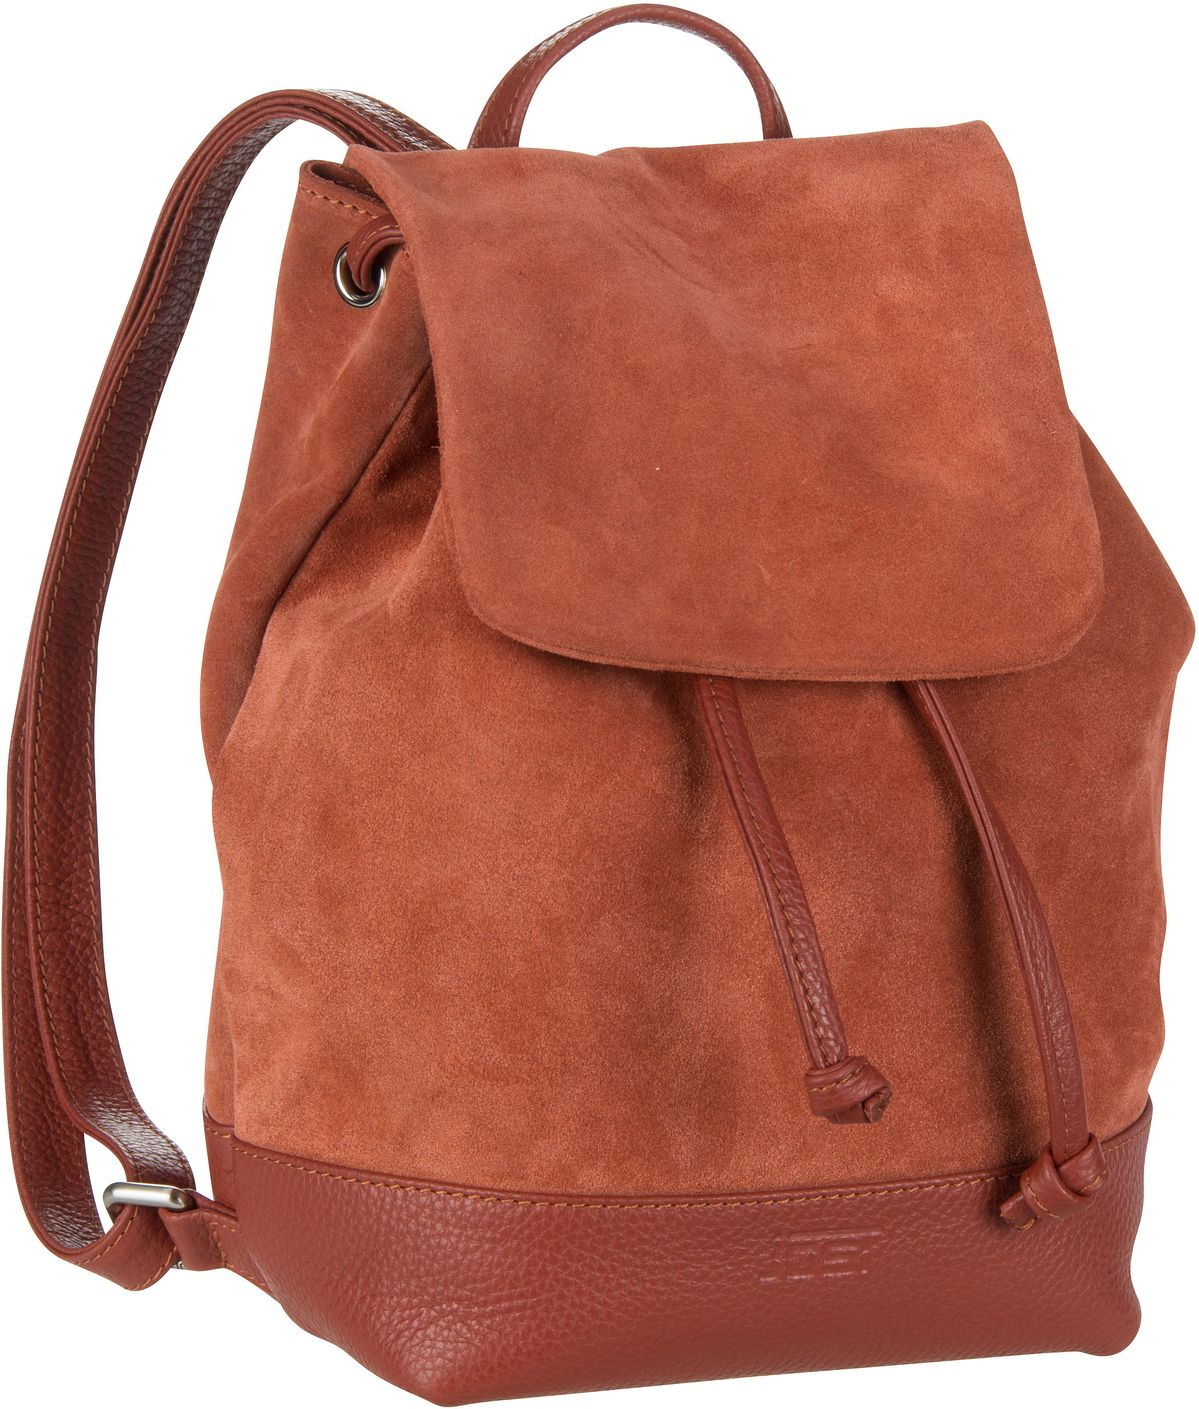 Rucksack / Daypack Motala 1745 Drawstring Backpack k